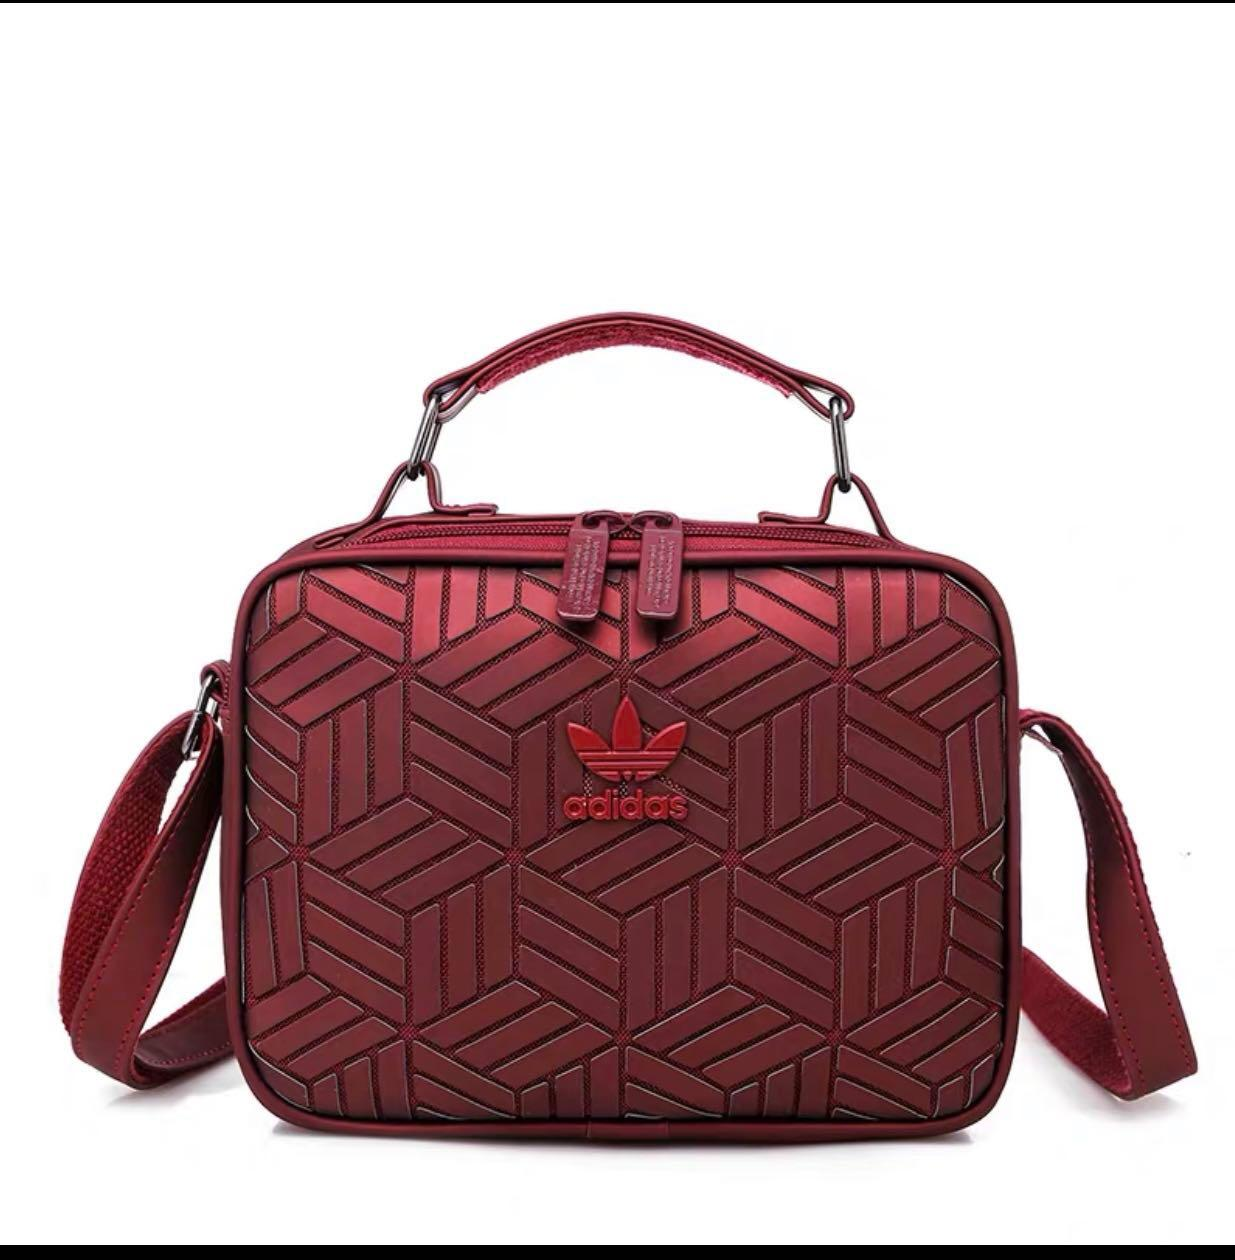 Adidas 2019 Latest Design Sling bag